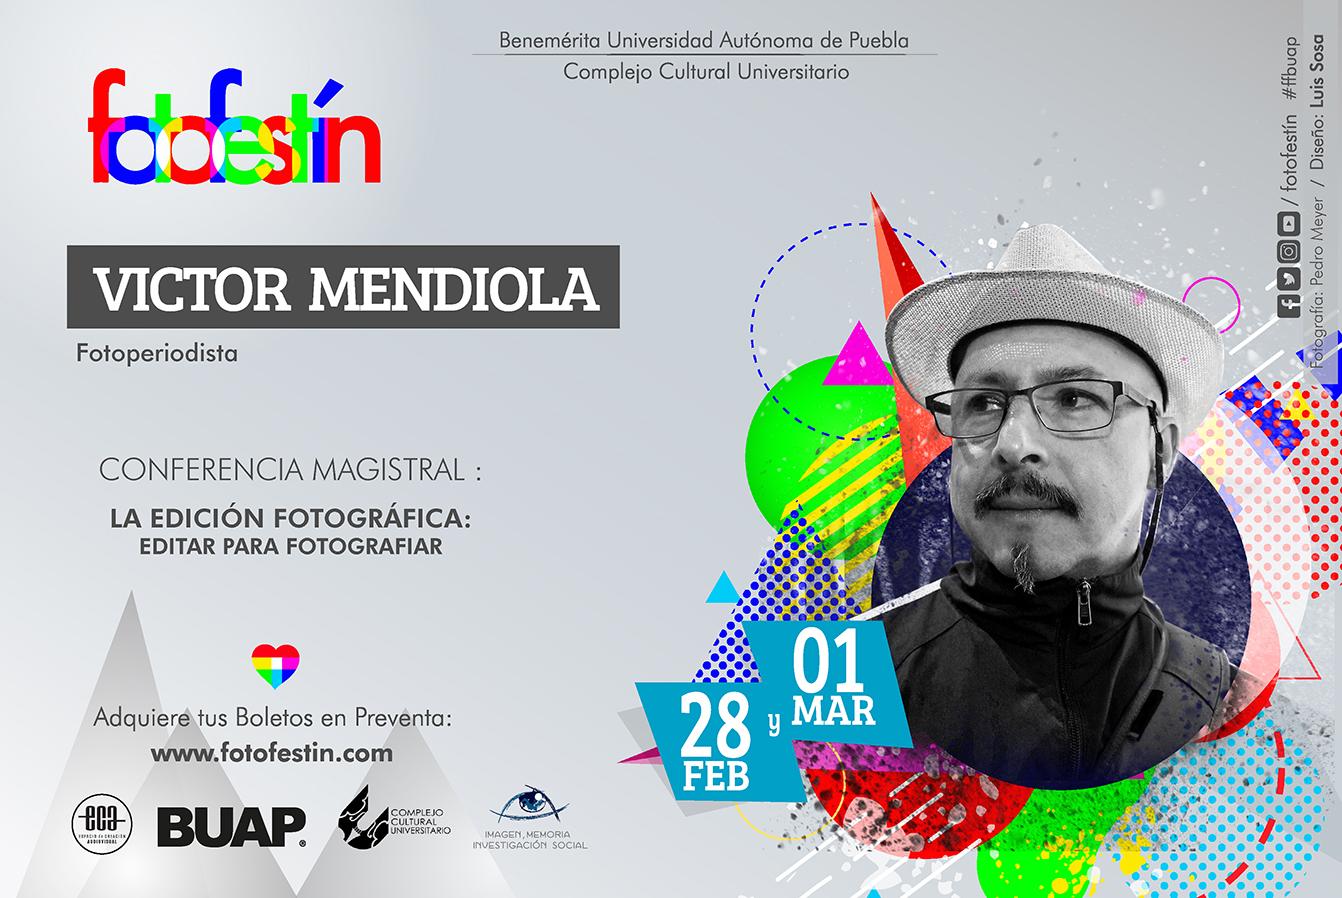 Victor Mendiola Conferencias de fotografia fotofestin